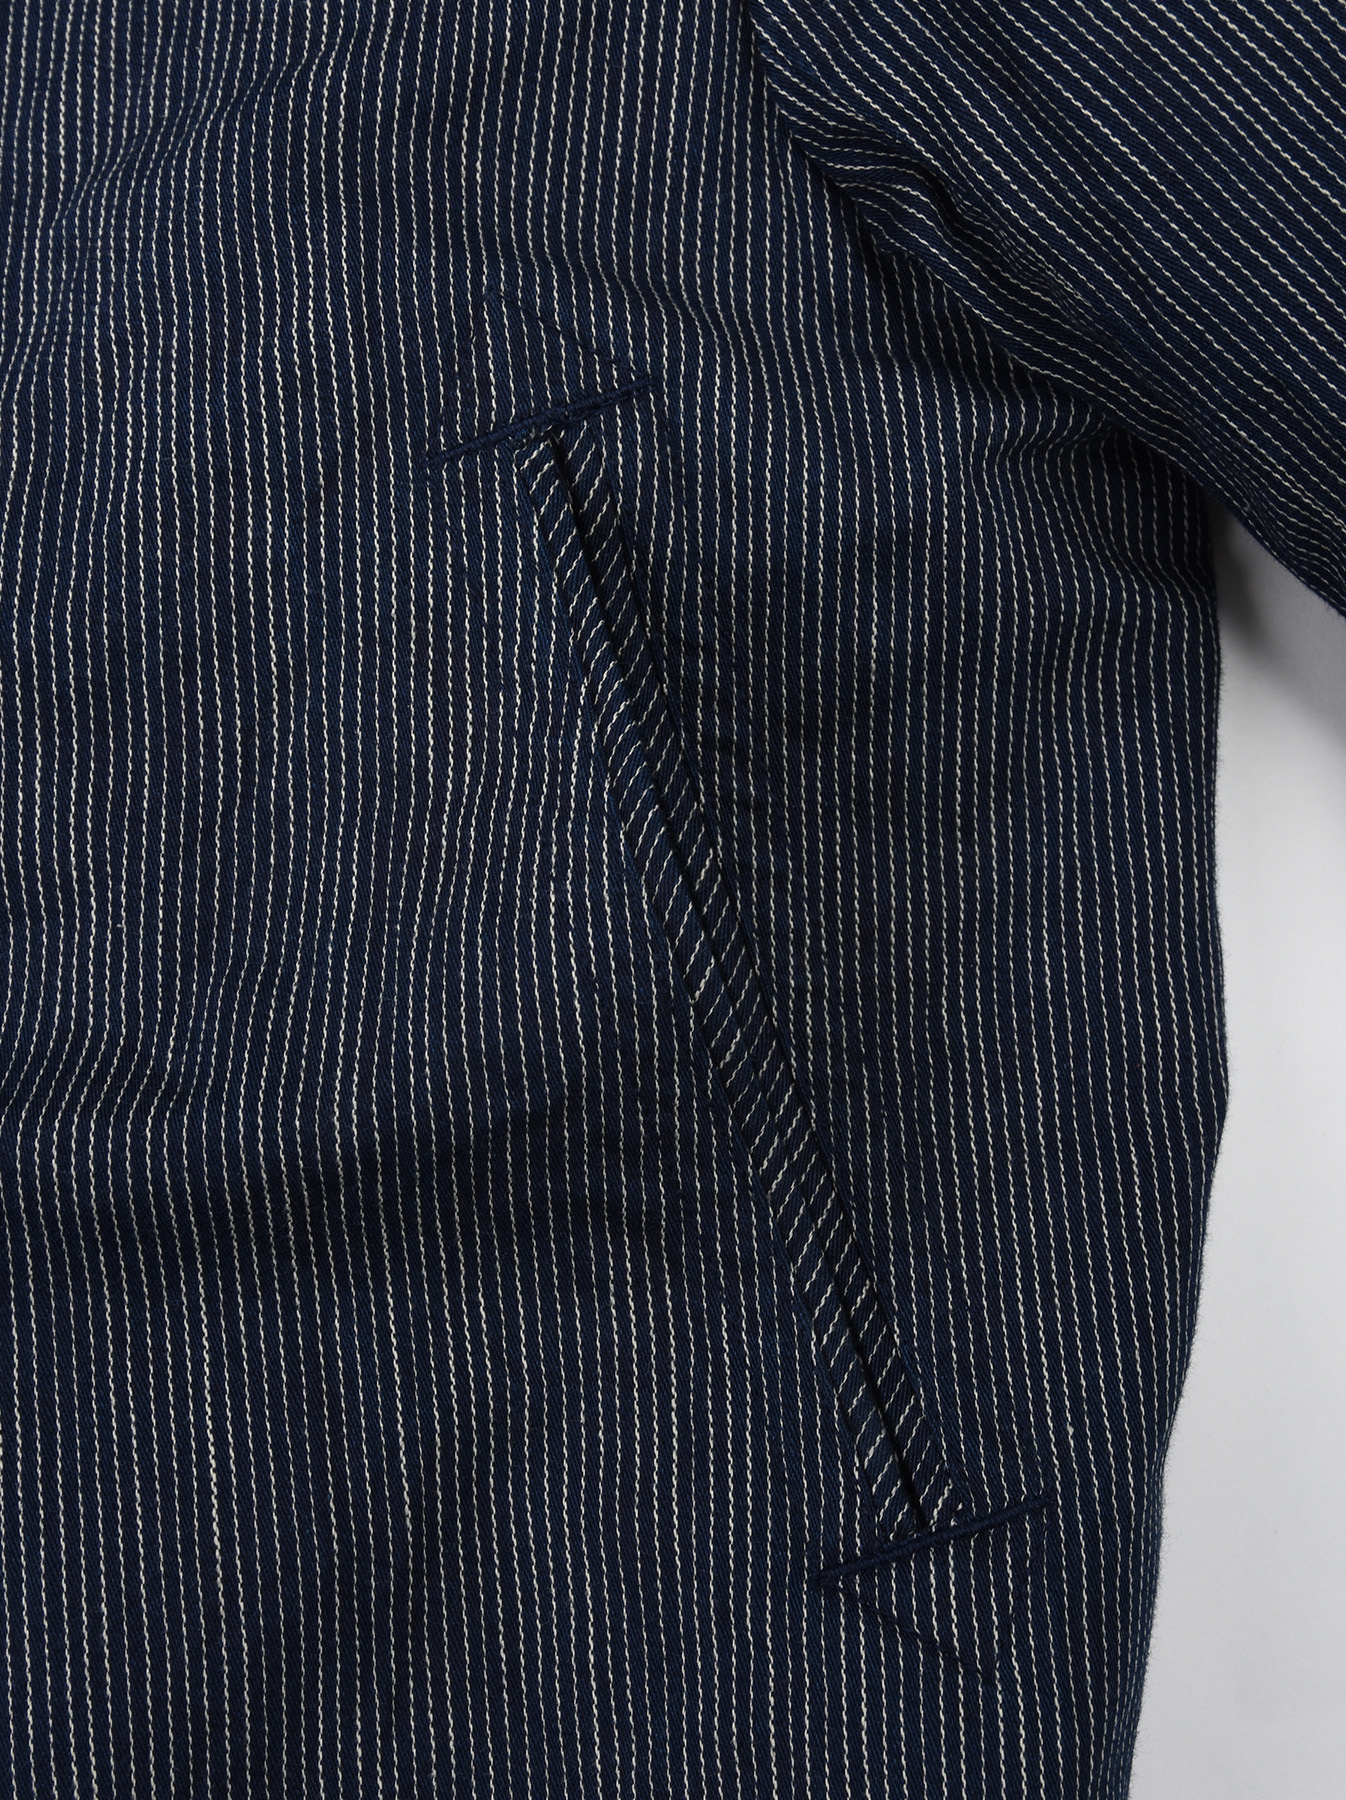 WH Indigo Mugi Yoko-shusi P-coat-12